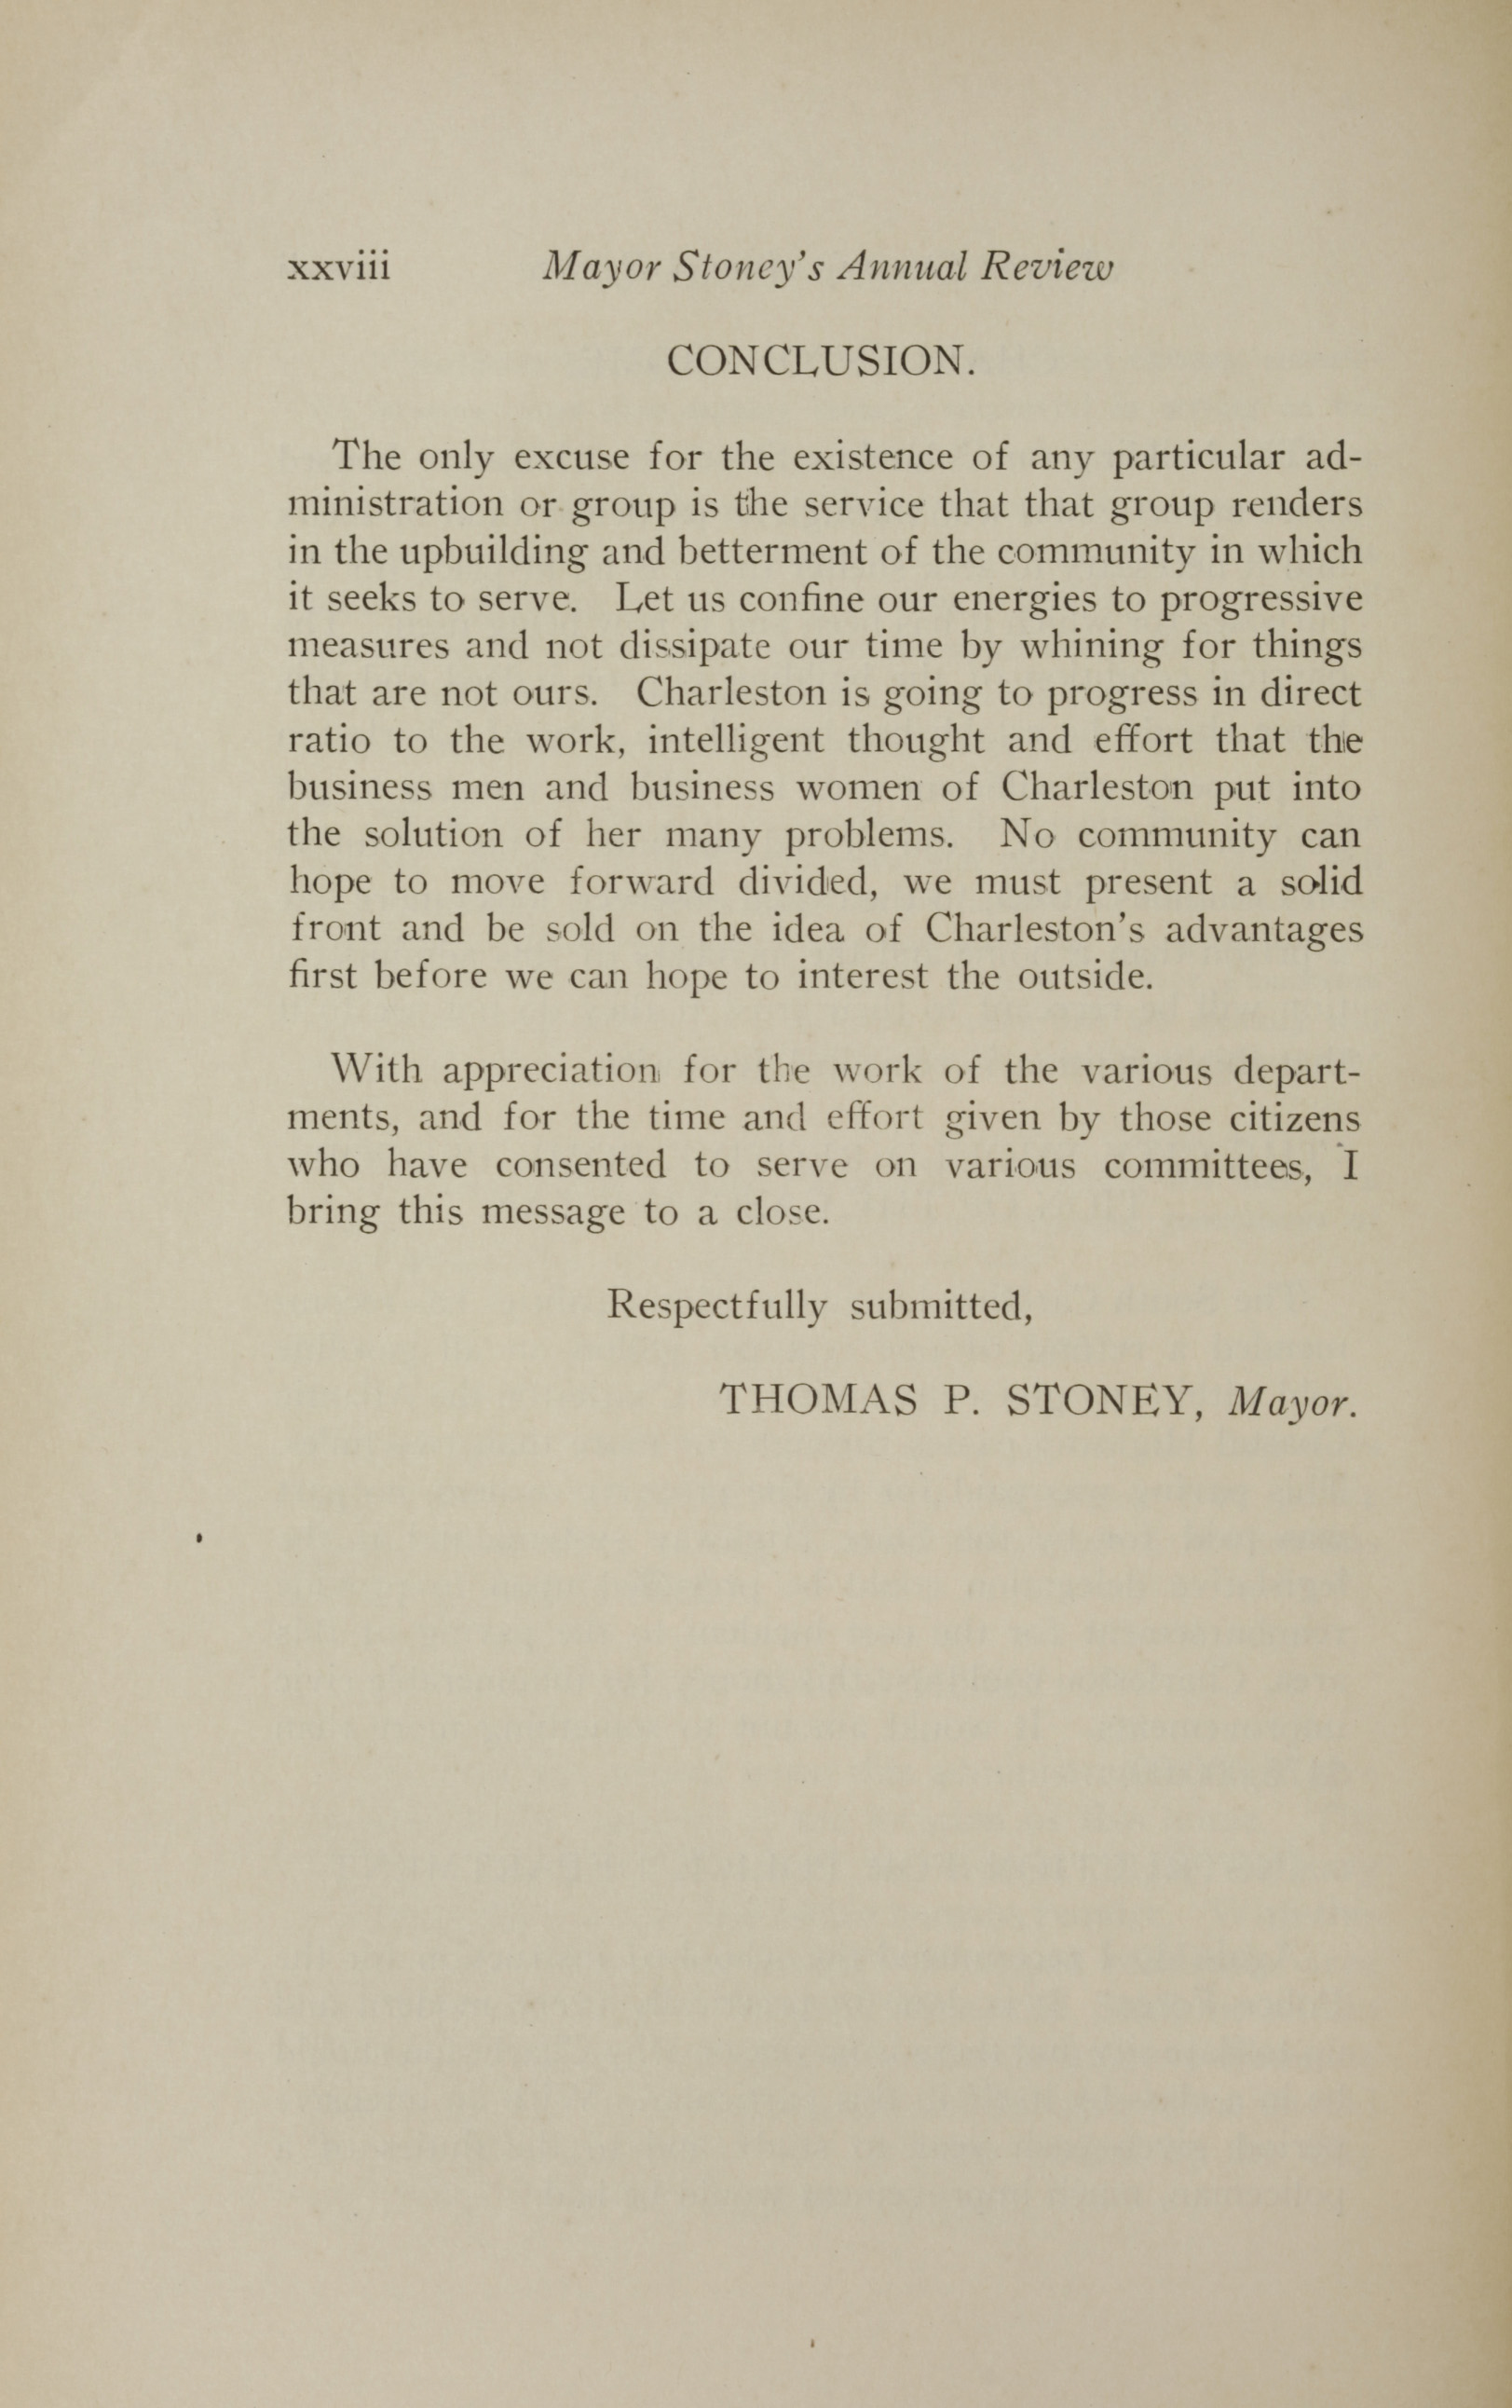 Charleston Yearbook, 1928, page xxviii